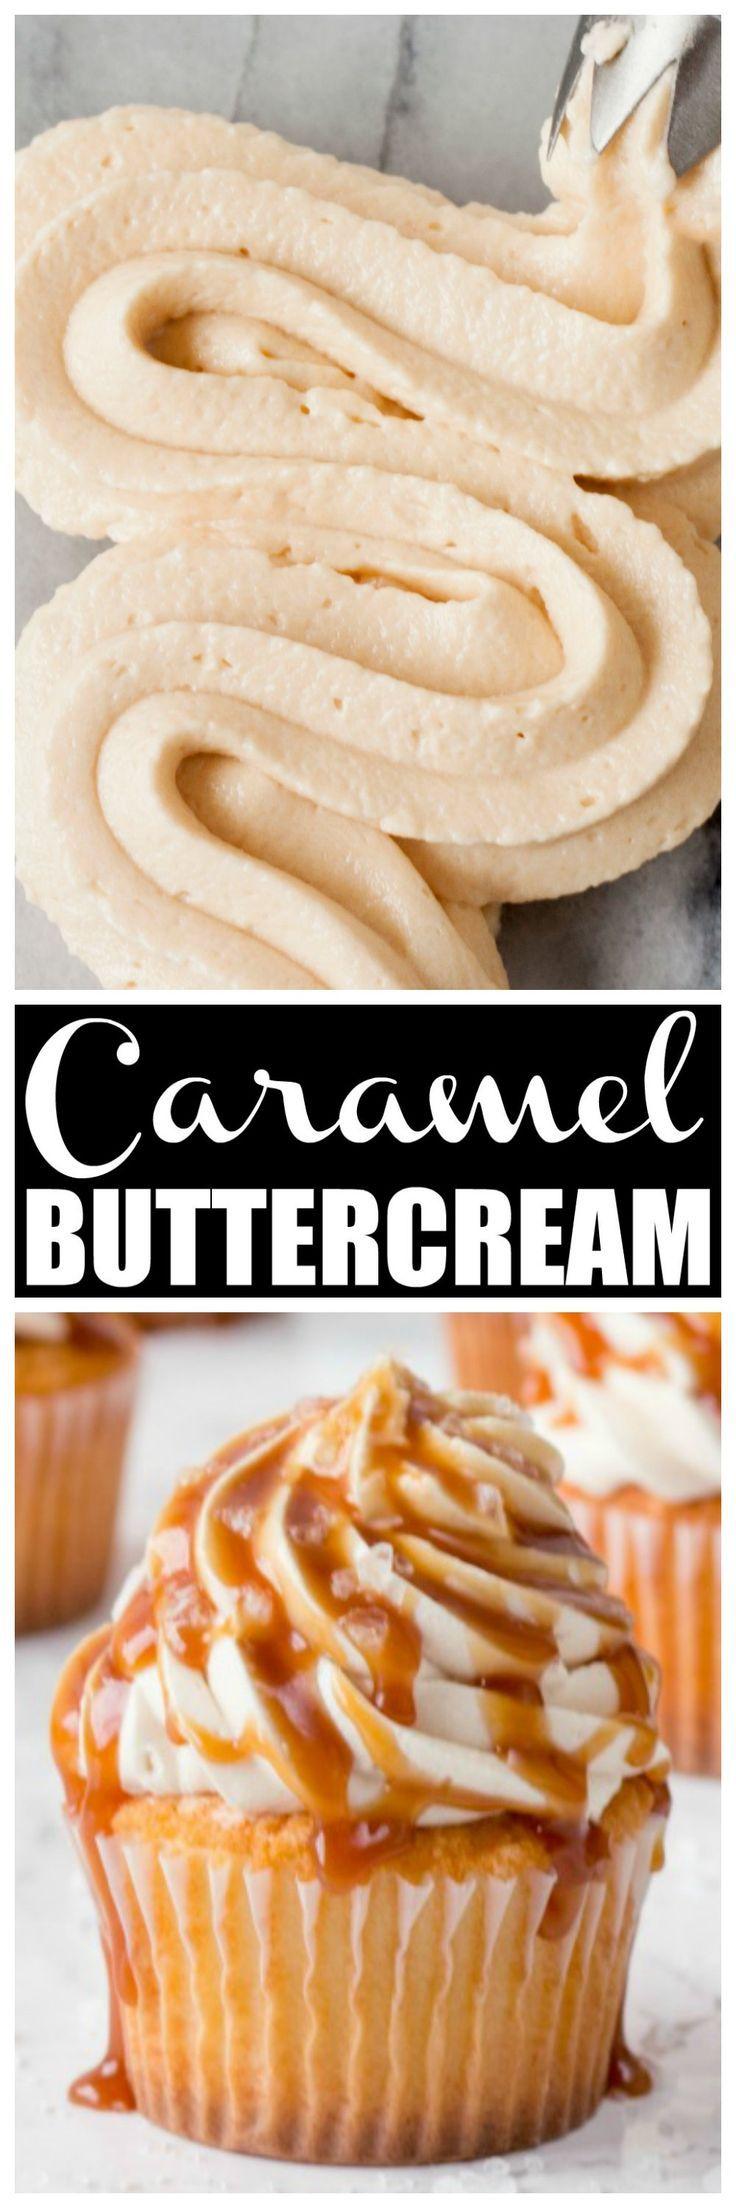 Bakery Style Caramel Buttercream Frosting • MidgetMomma